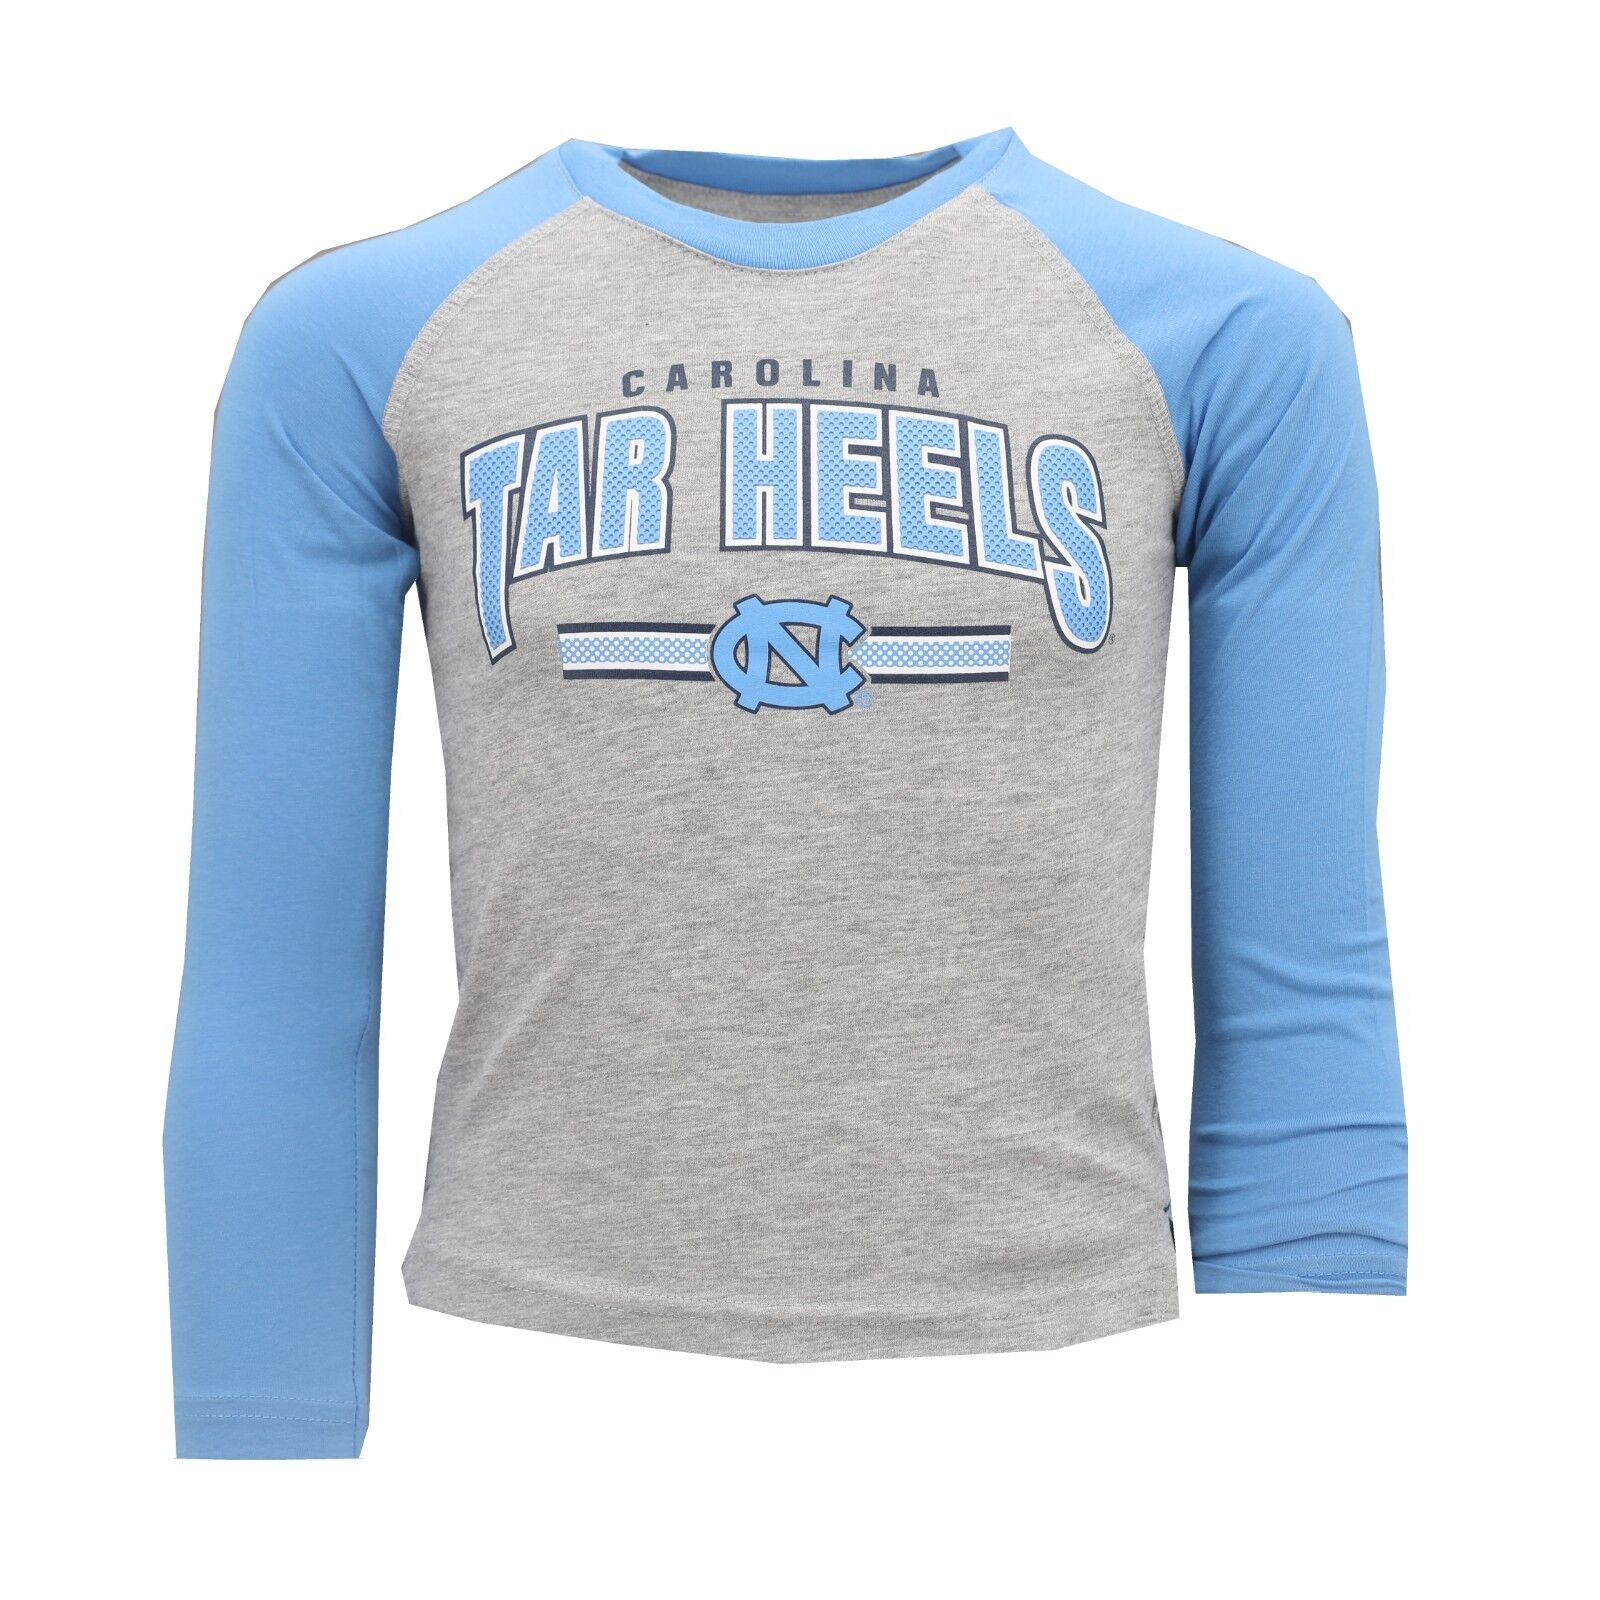 NCAA Youth Boys Team Logo Long Sleeve Tee